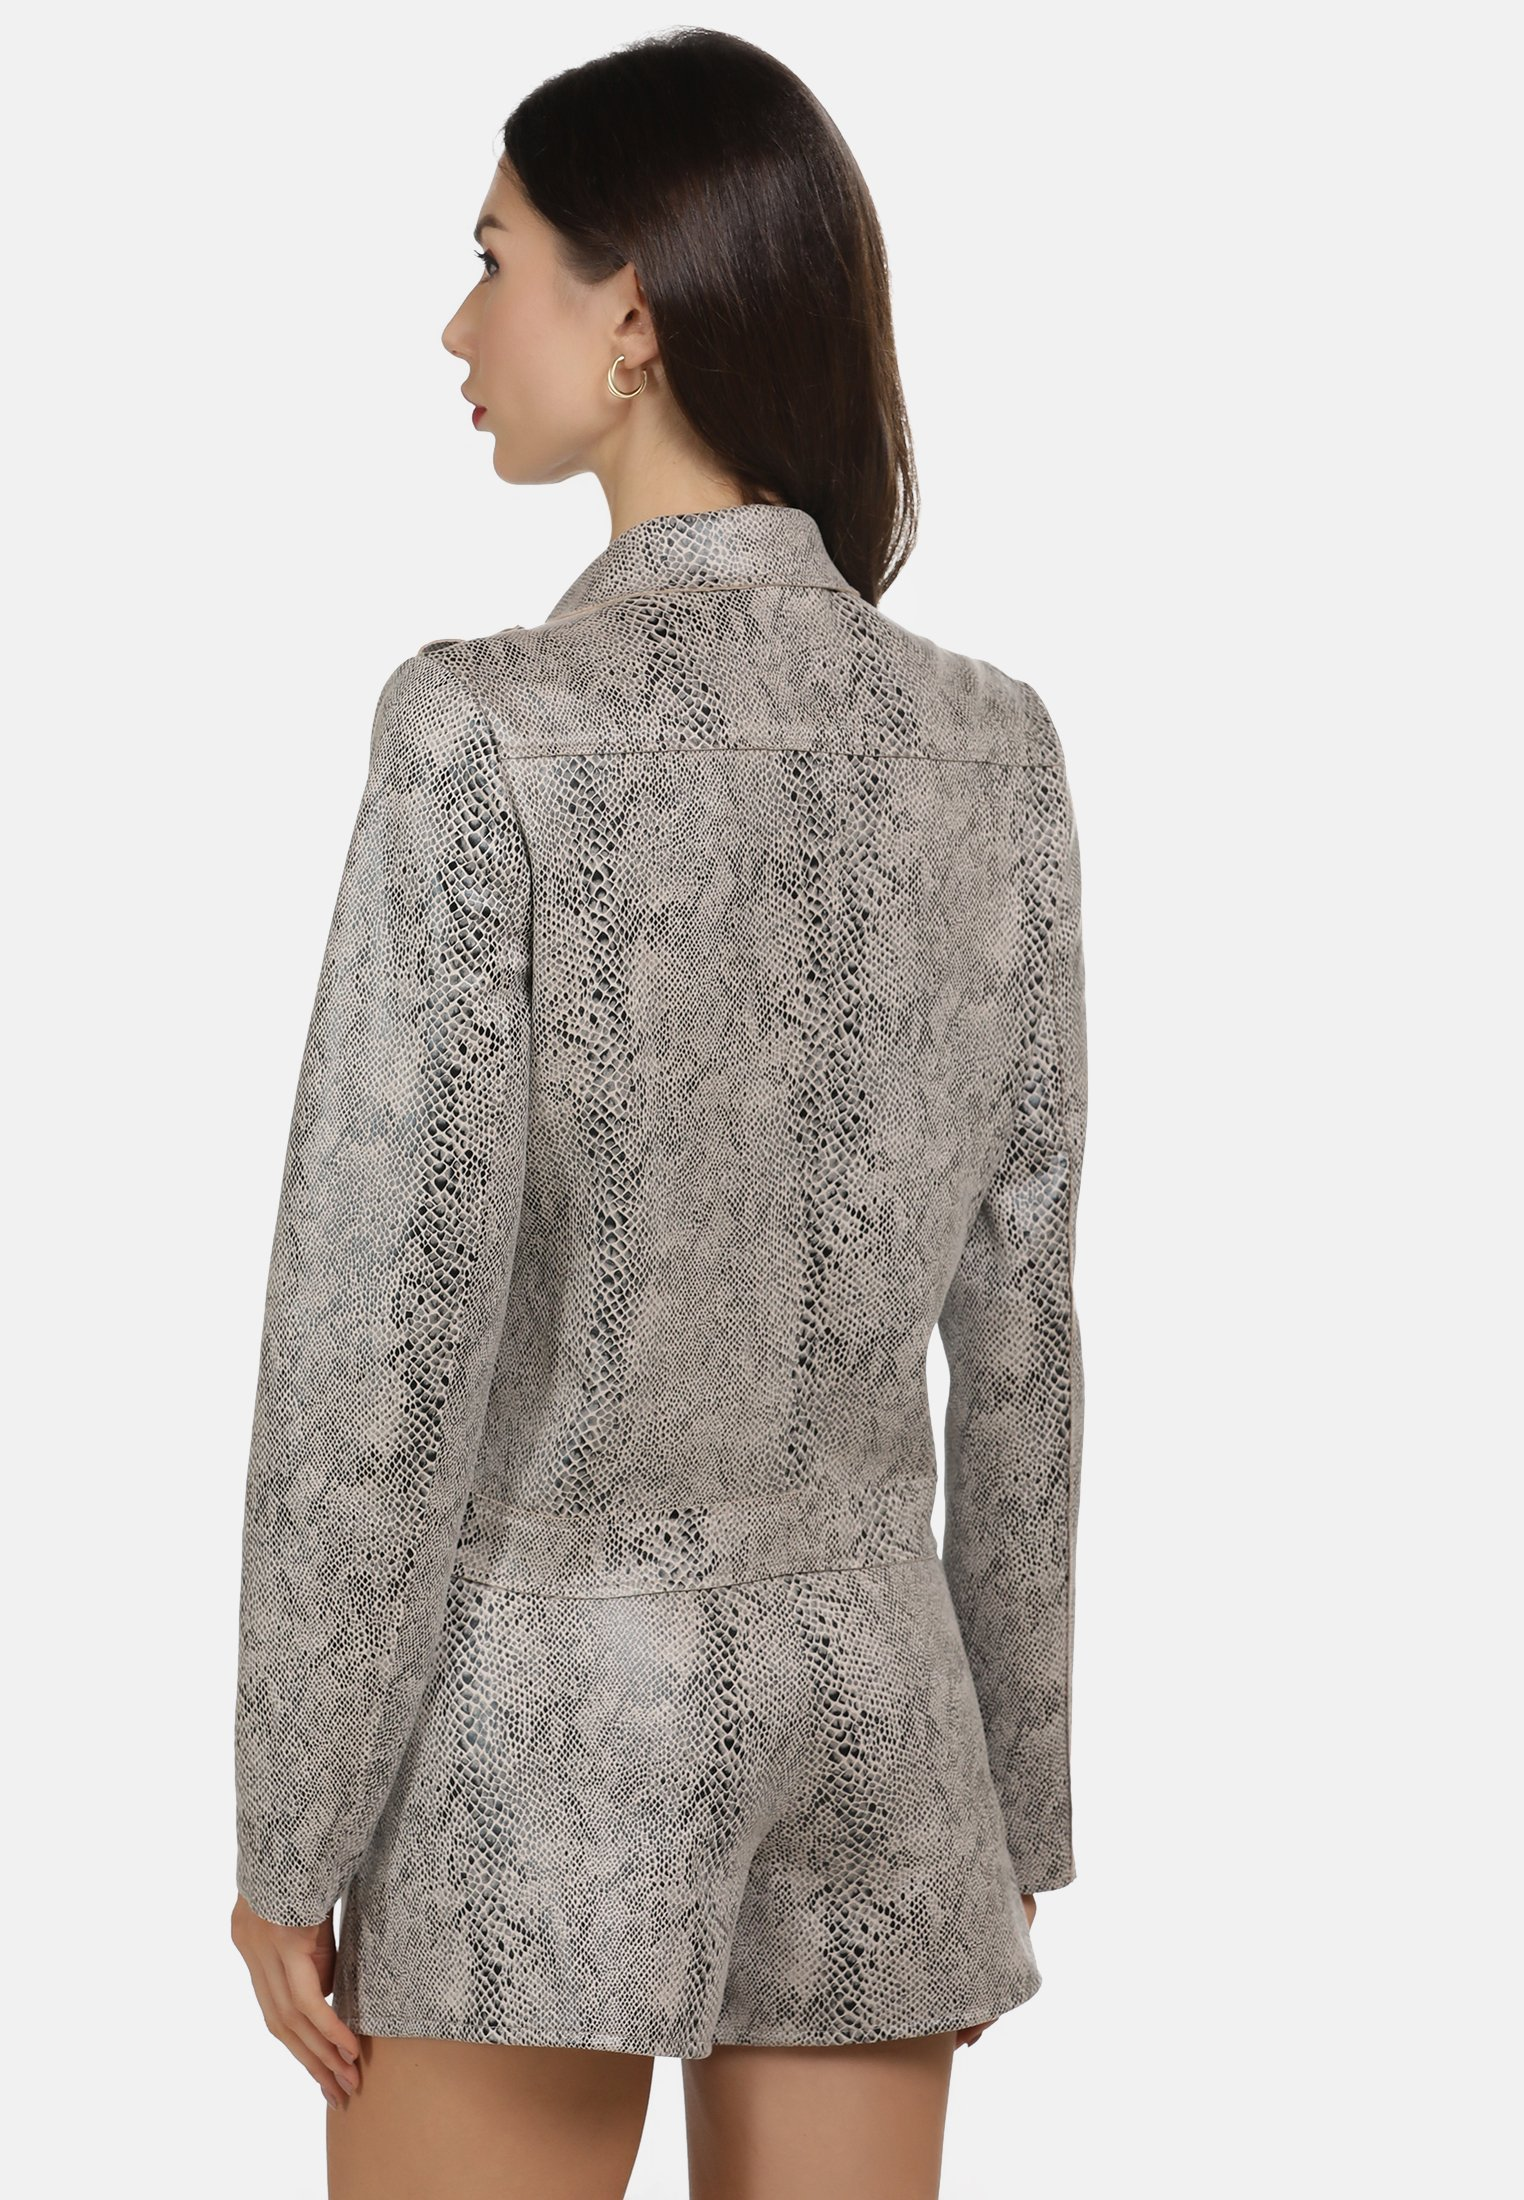 faina MIT SCHLANGENPRINT - Veste en similicuir - grey - Vestes Femme Zunav